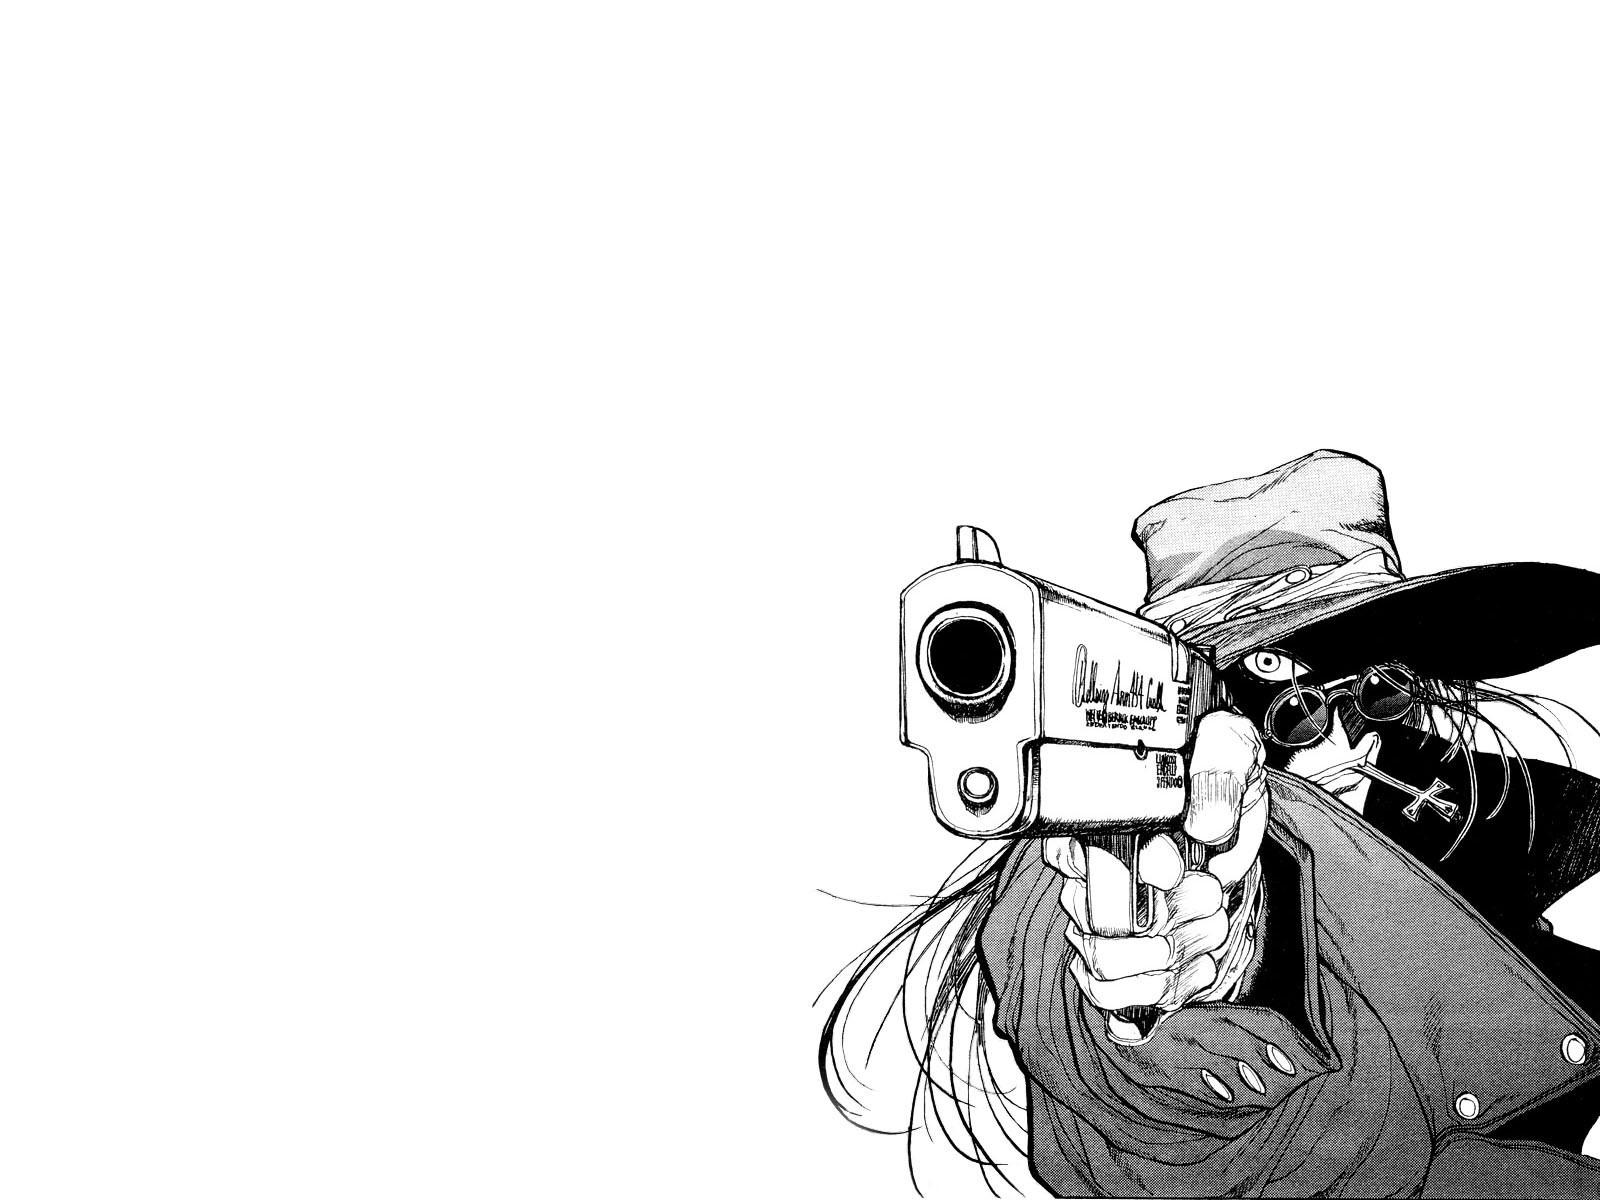 Gambar ilustrasi hellsing alucard manga gambar kartun sketsa